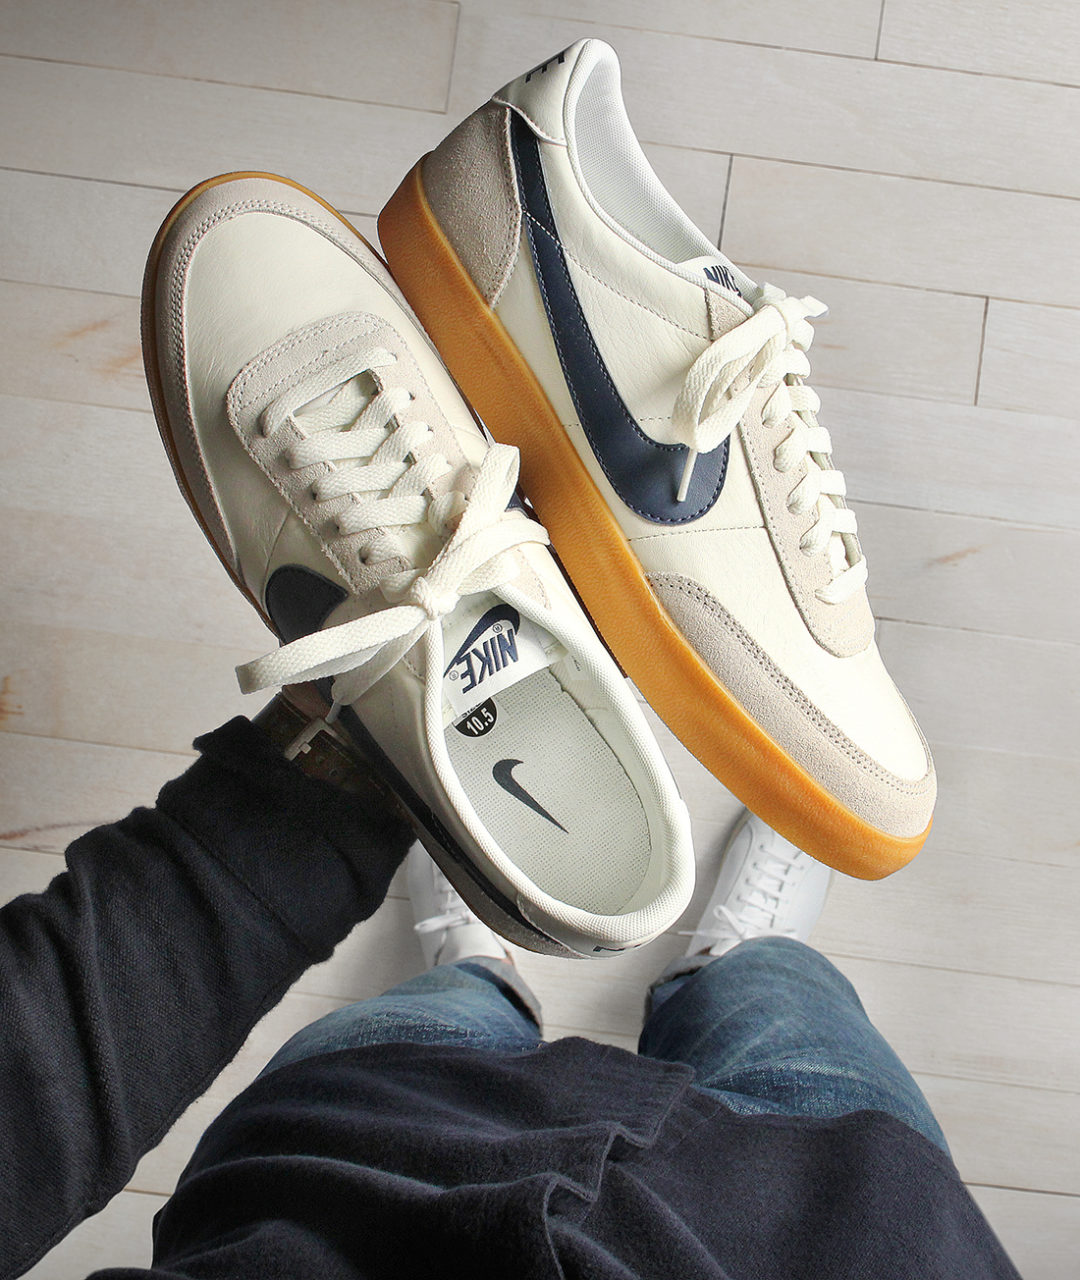 J.Crew + Nike Killshot 2 Restock - Phil Cohen  0b7b74af9